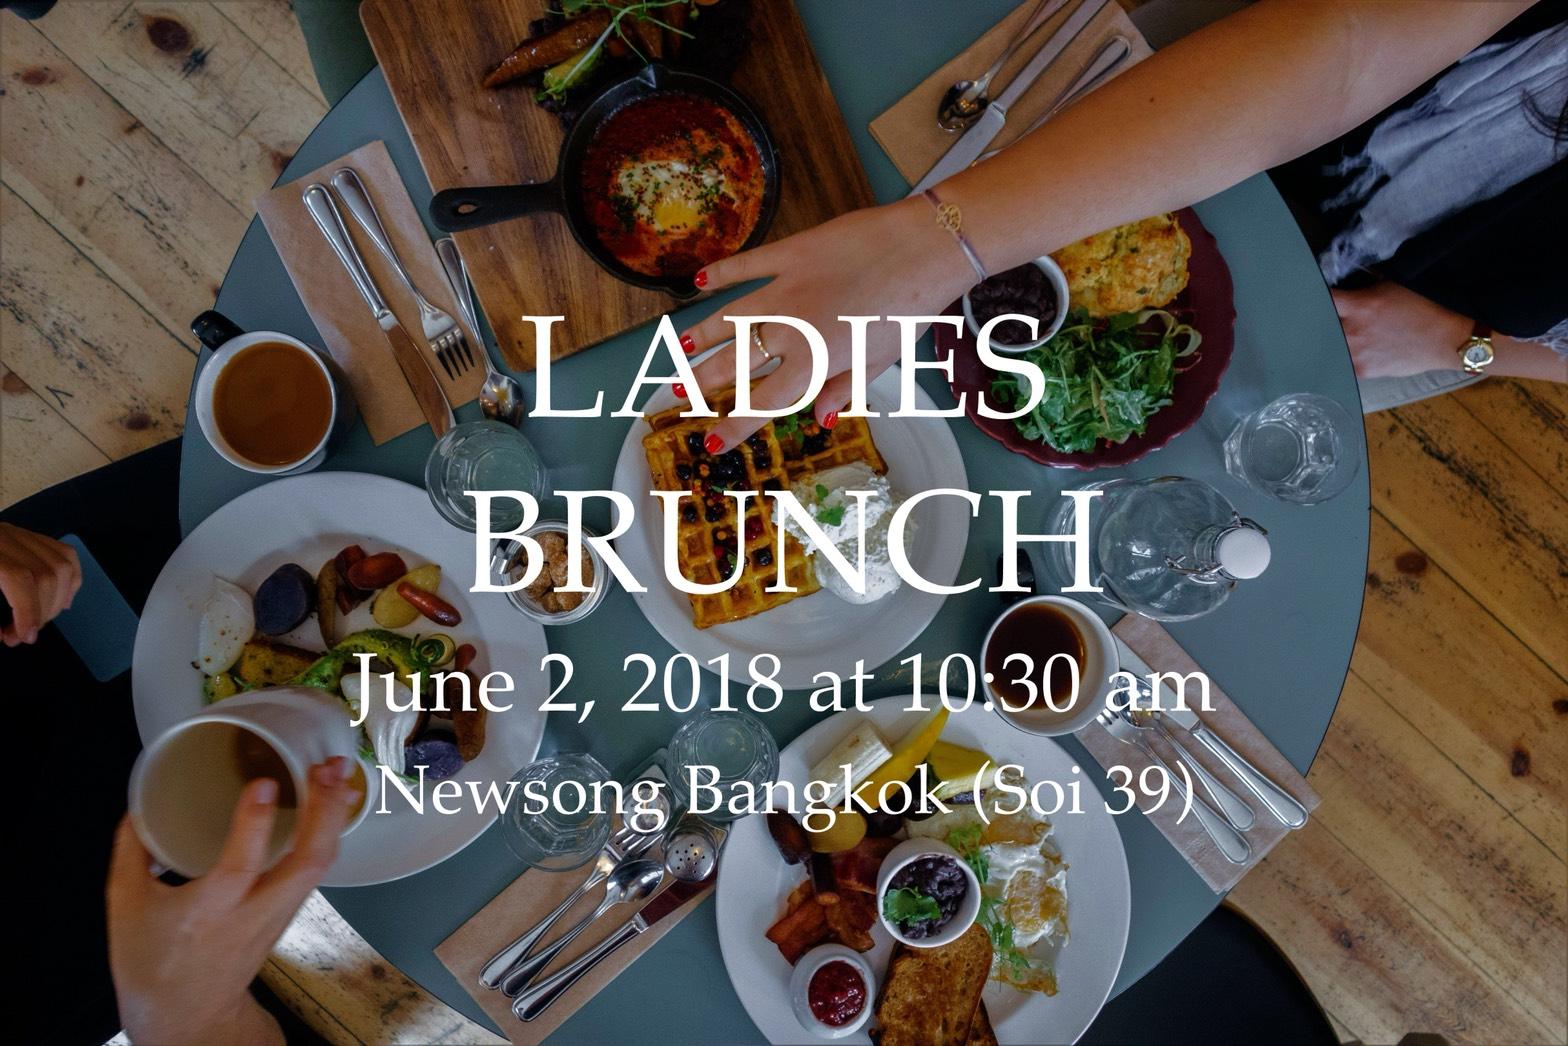 newsongbangkok brunch lady